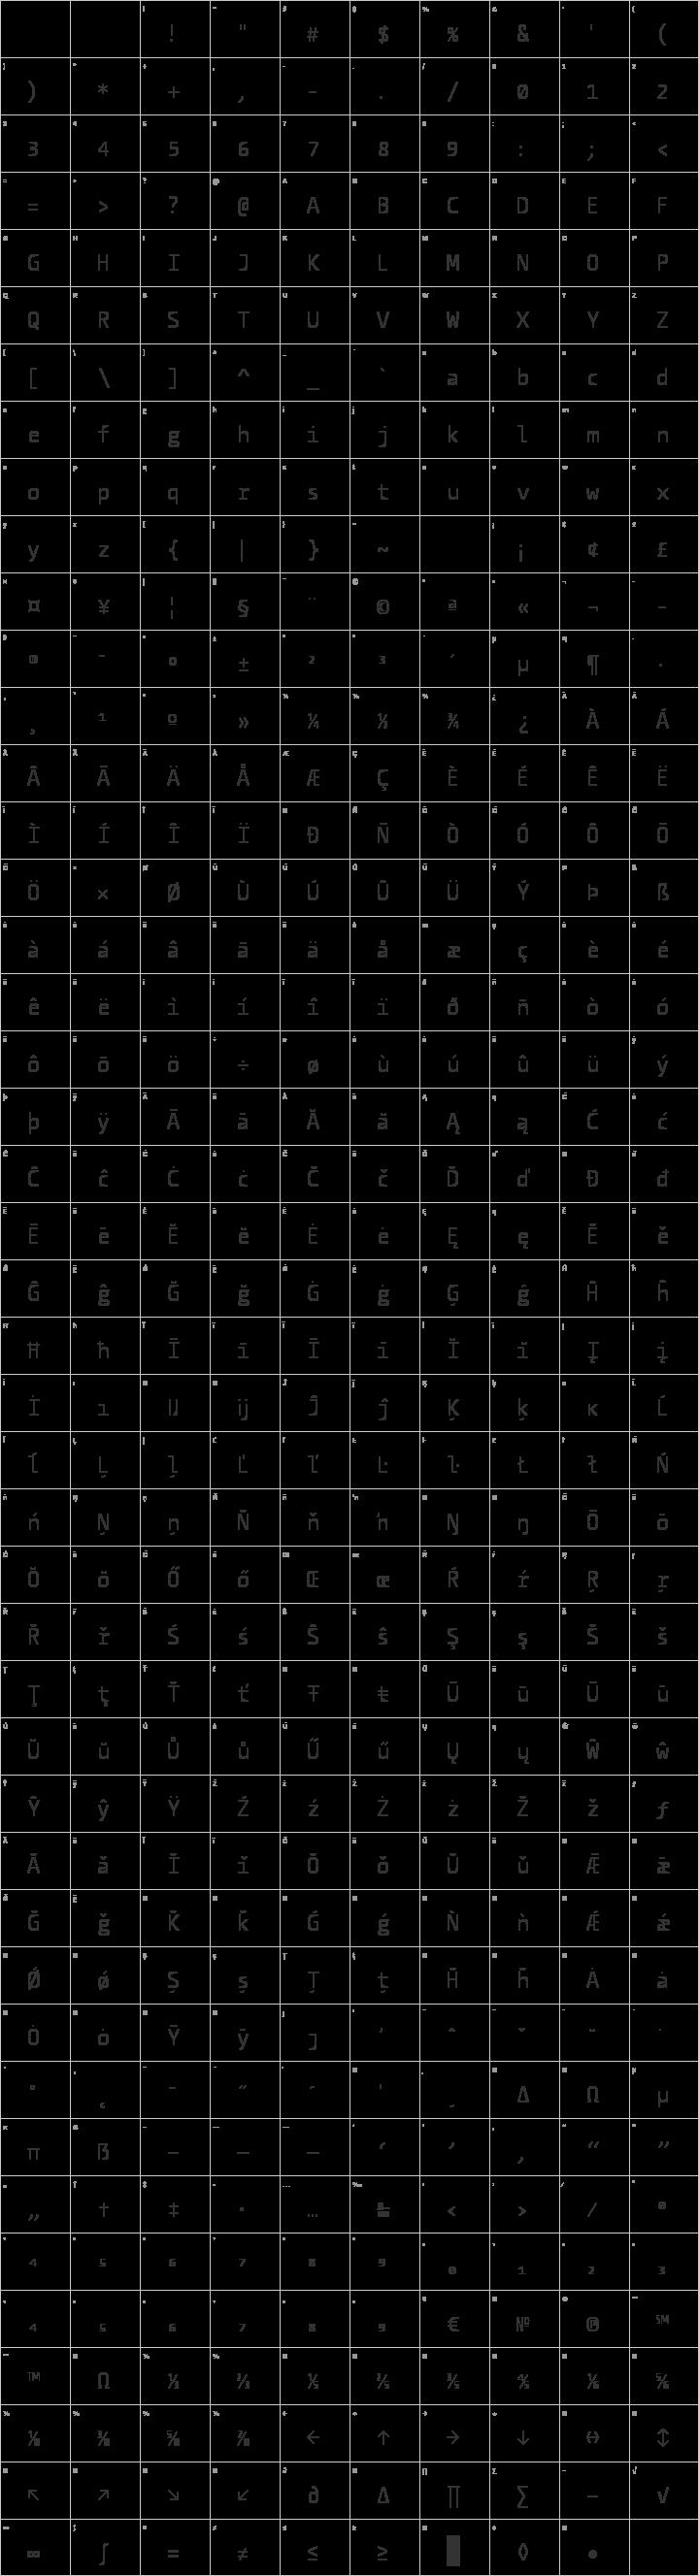 CamingoCode Glyph Map